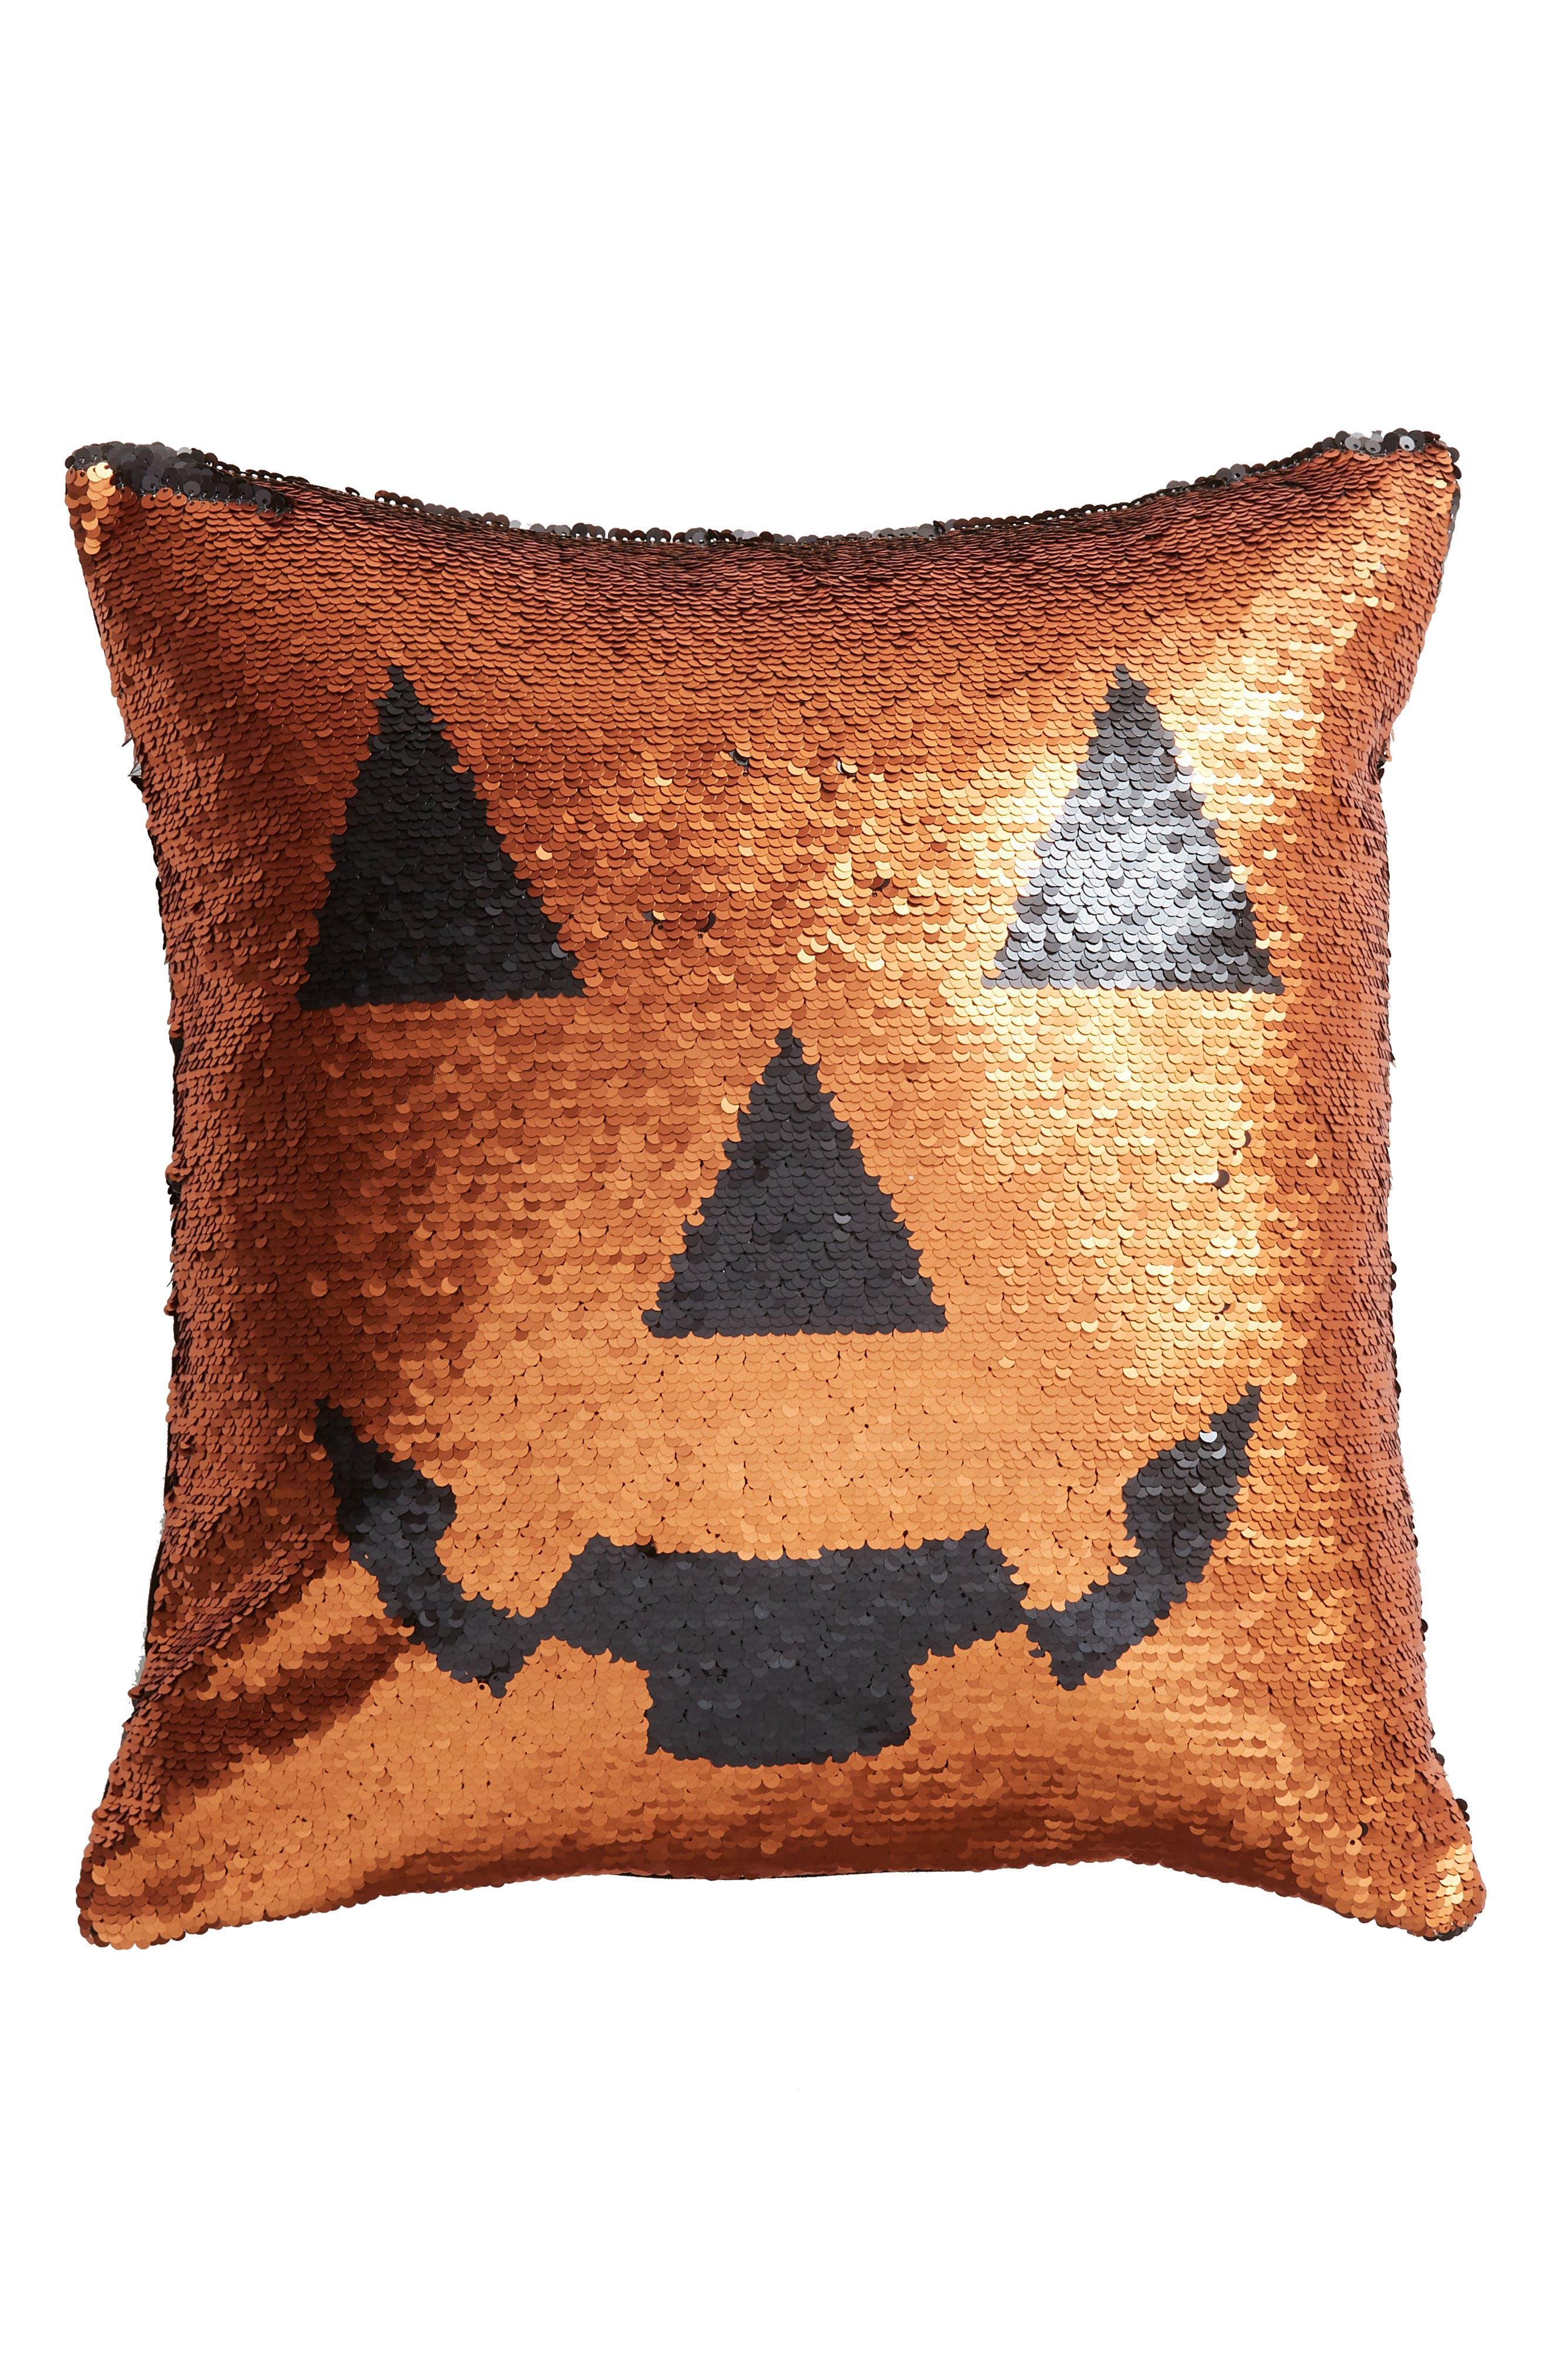 Pumpkin Sequin Accent Pillow,                             Main thumbnail 1, color,                             800